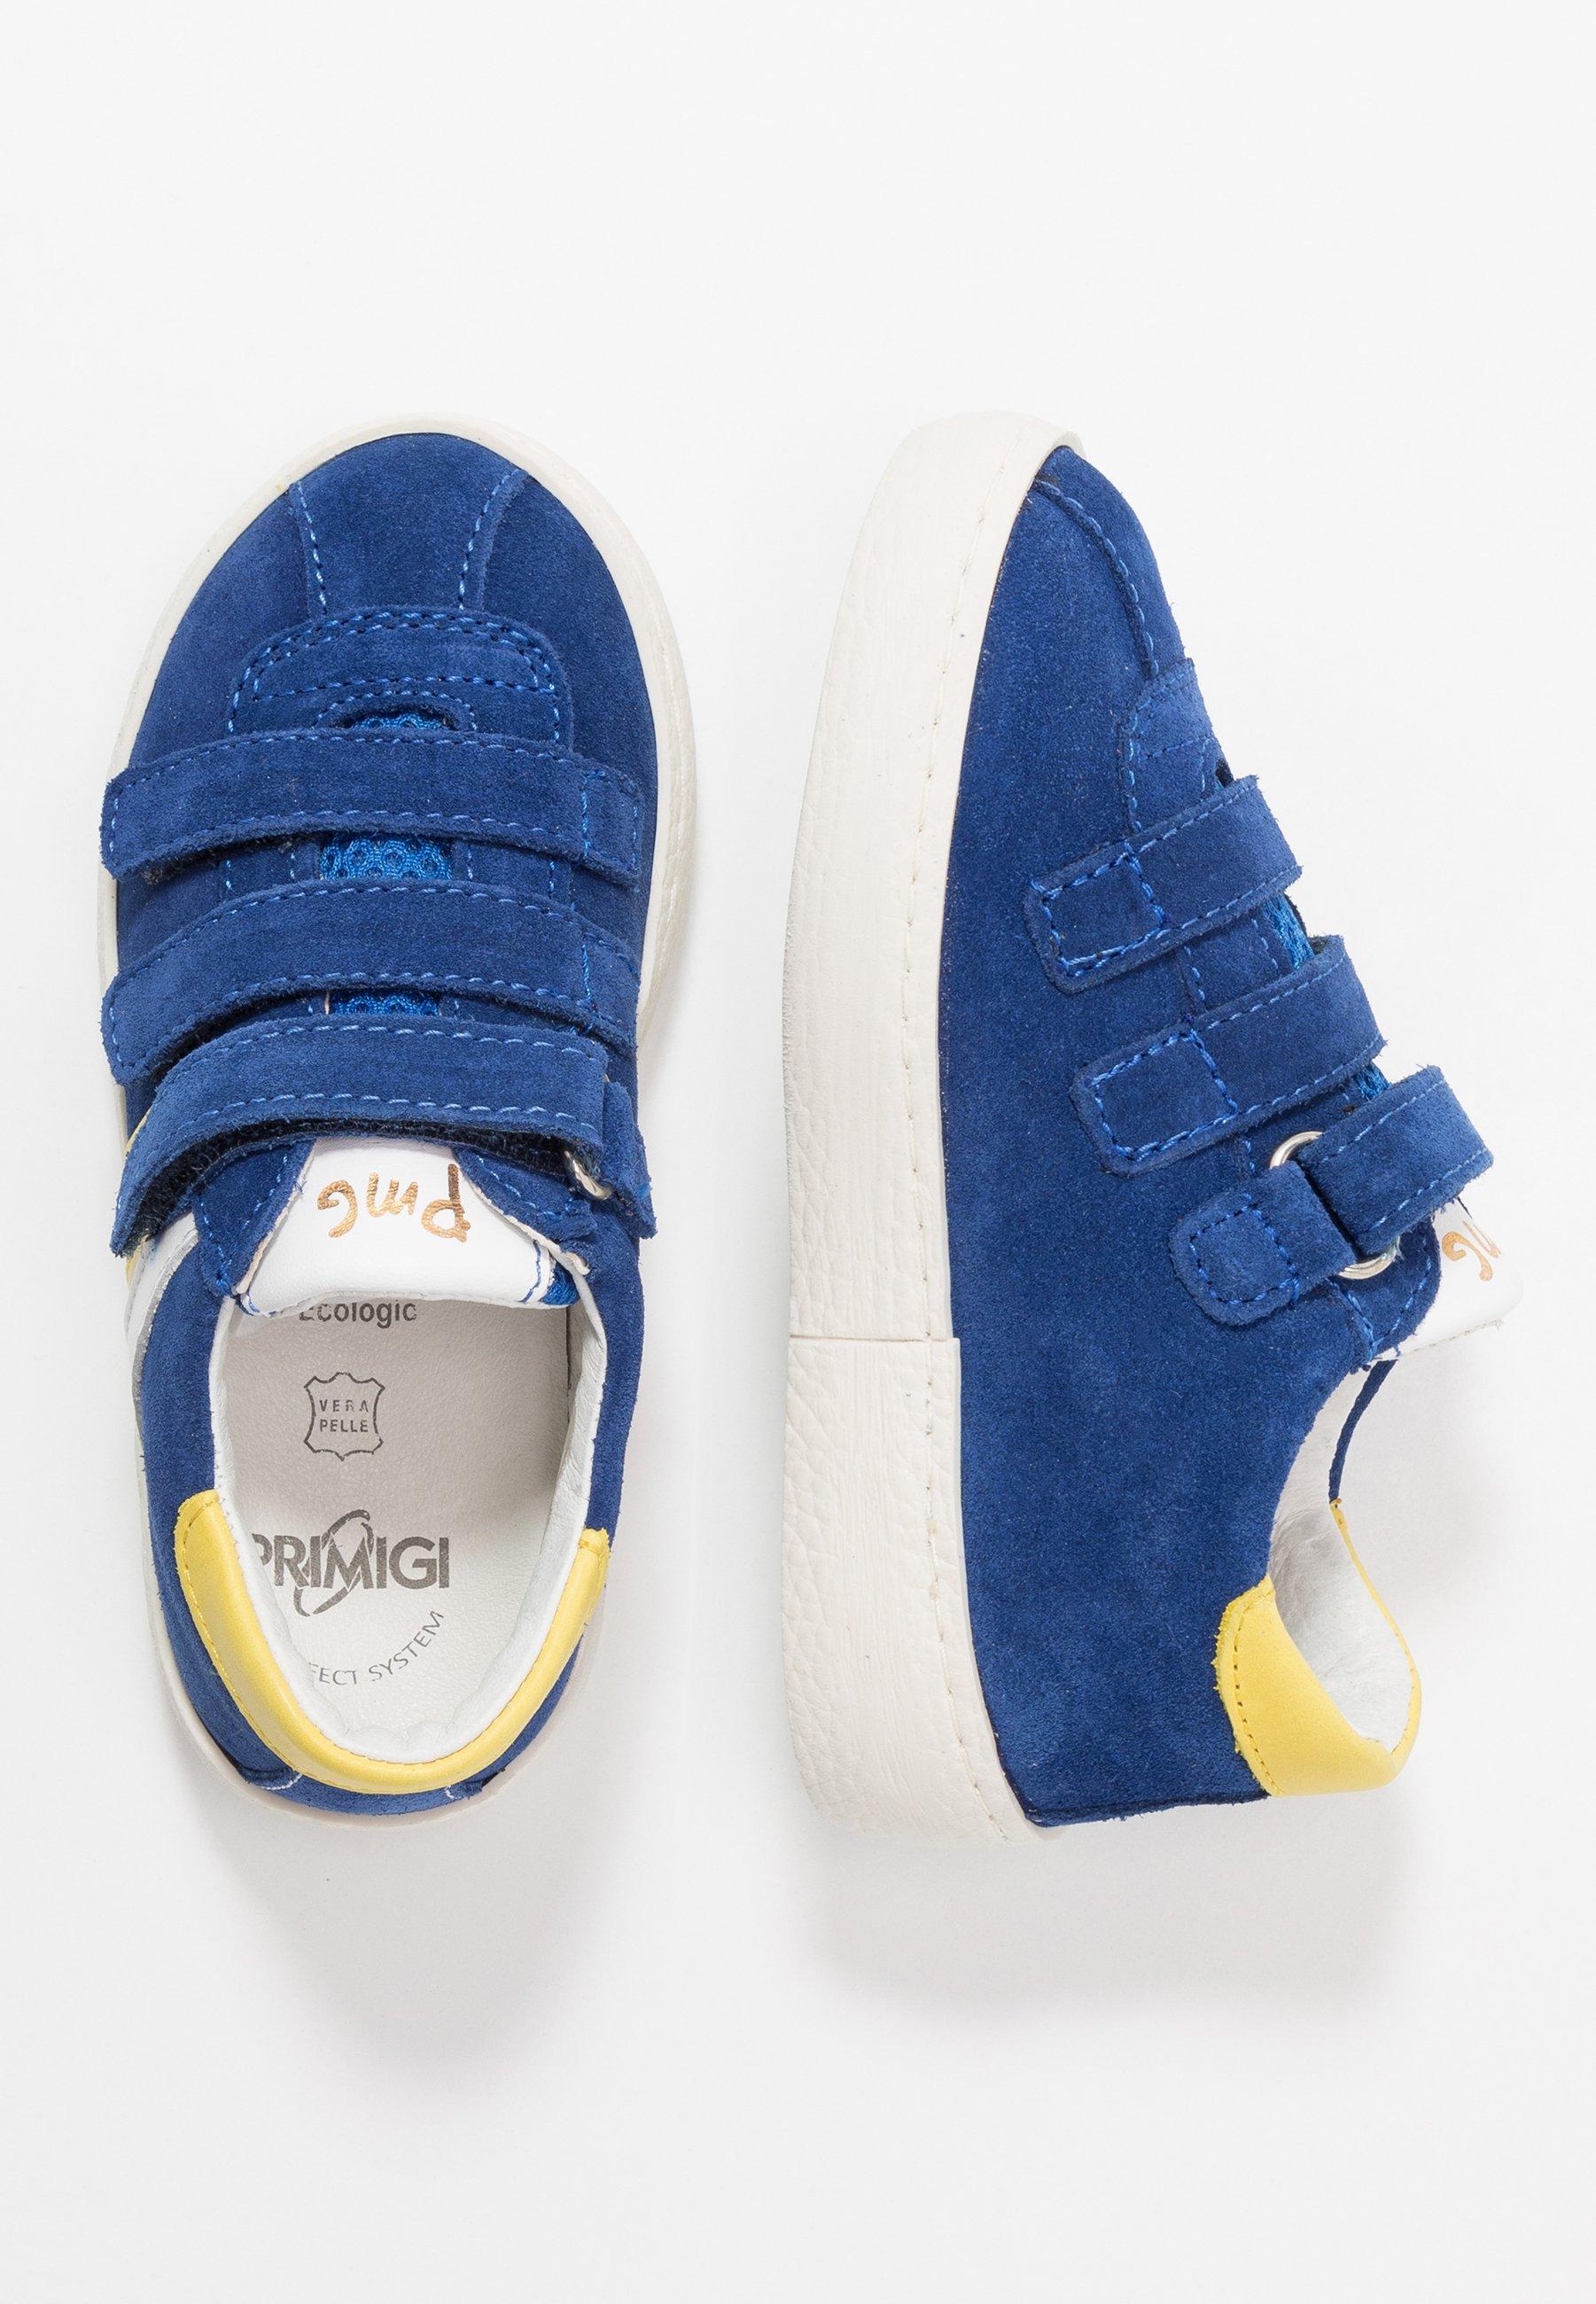 PRIMIGI, Sneakers Low für Jungen, blau   mirapodo